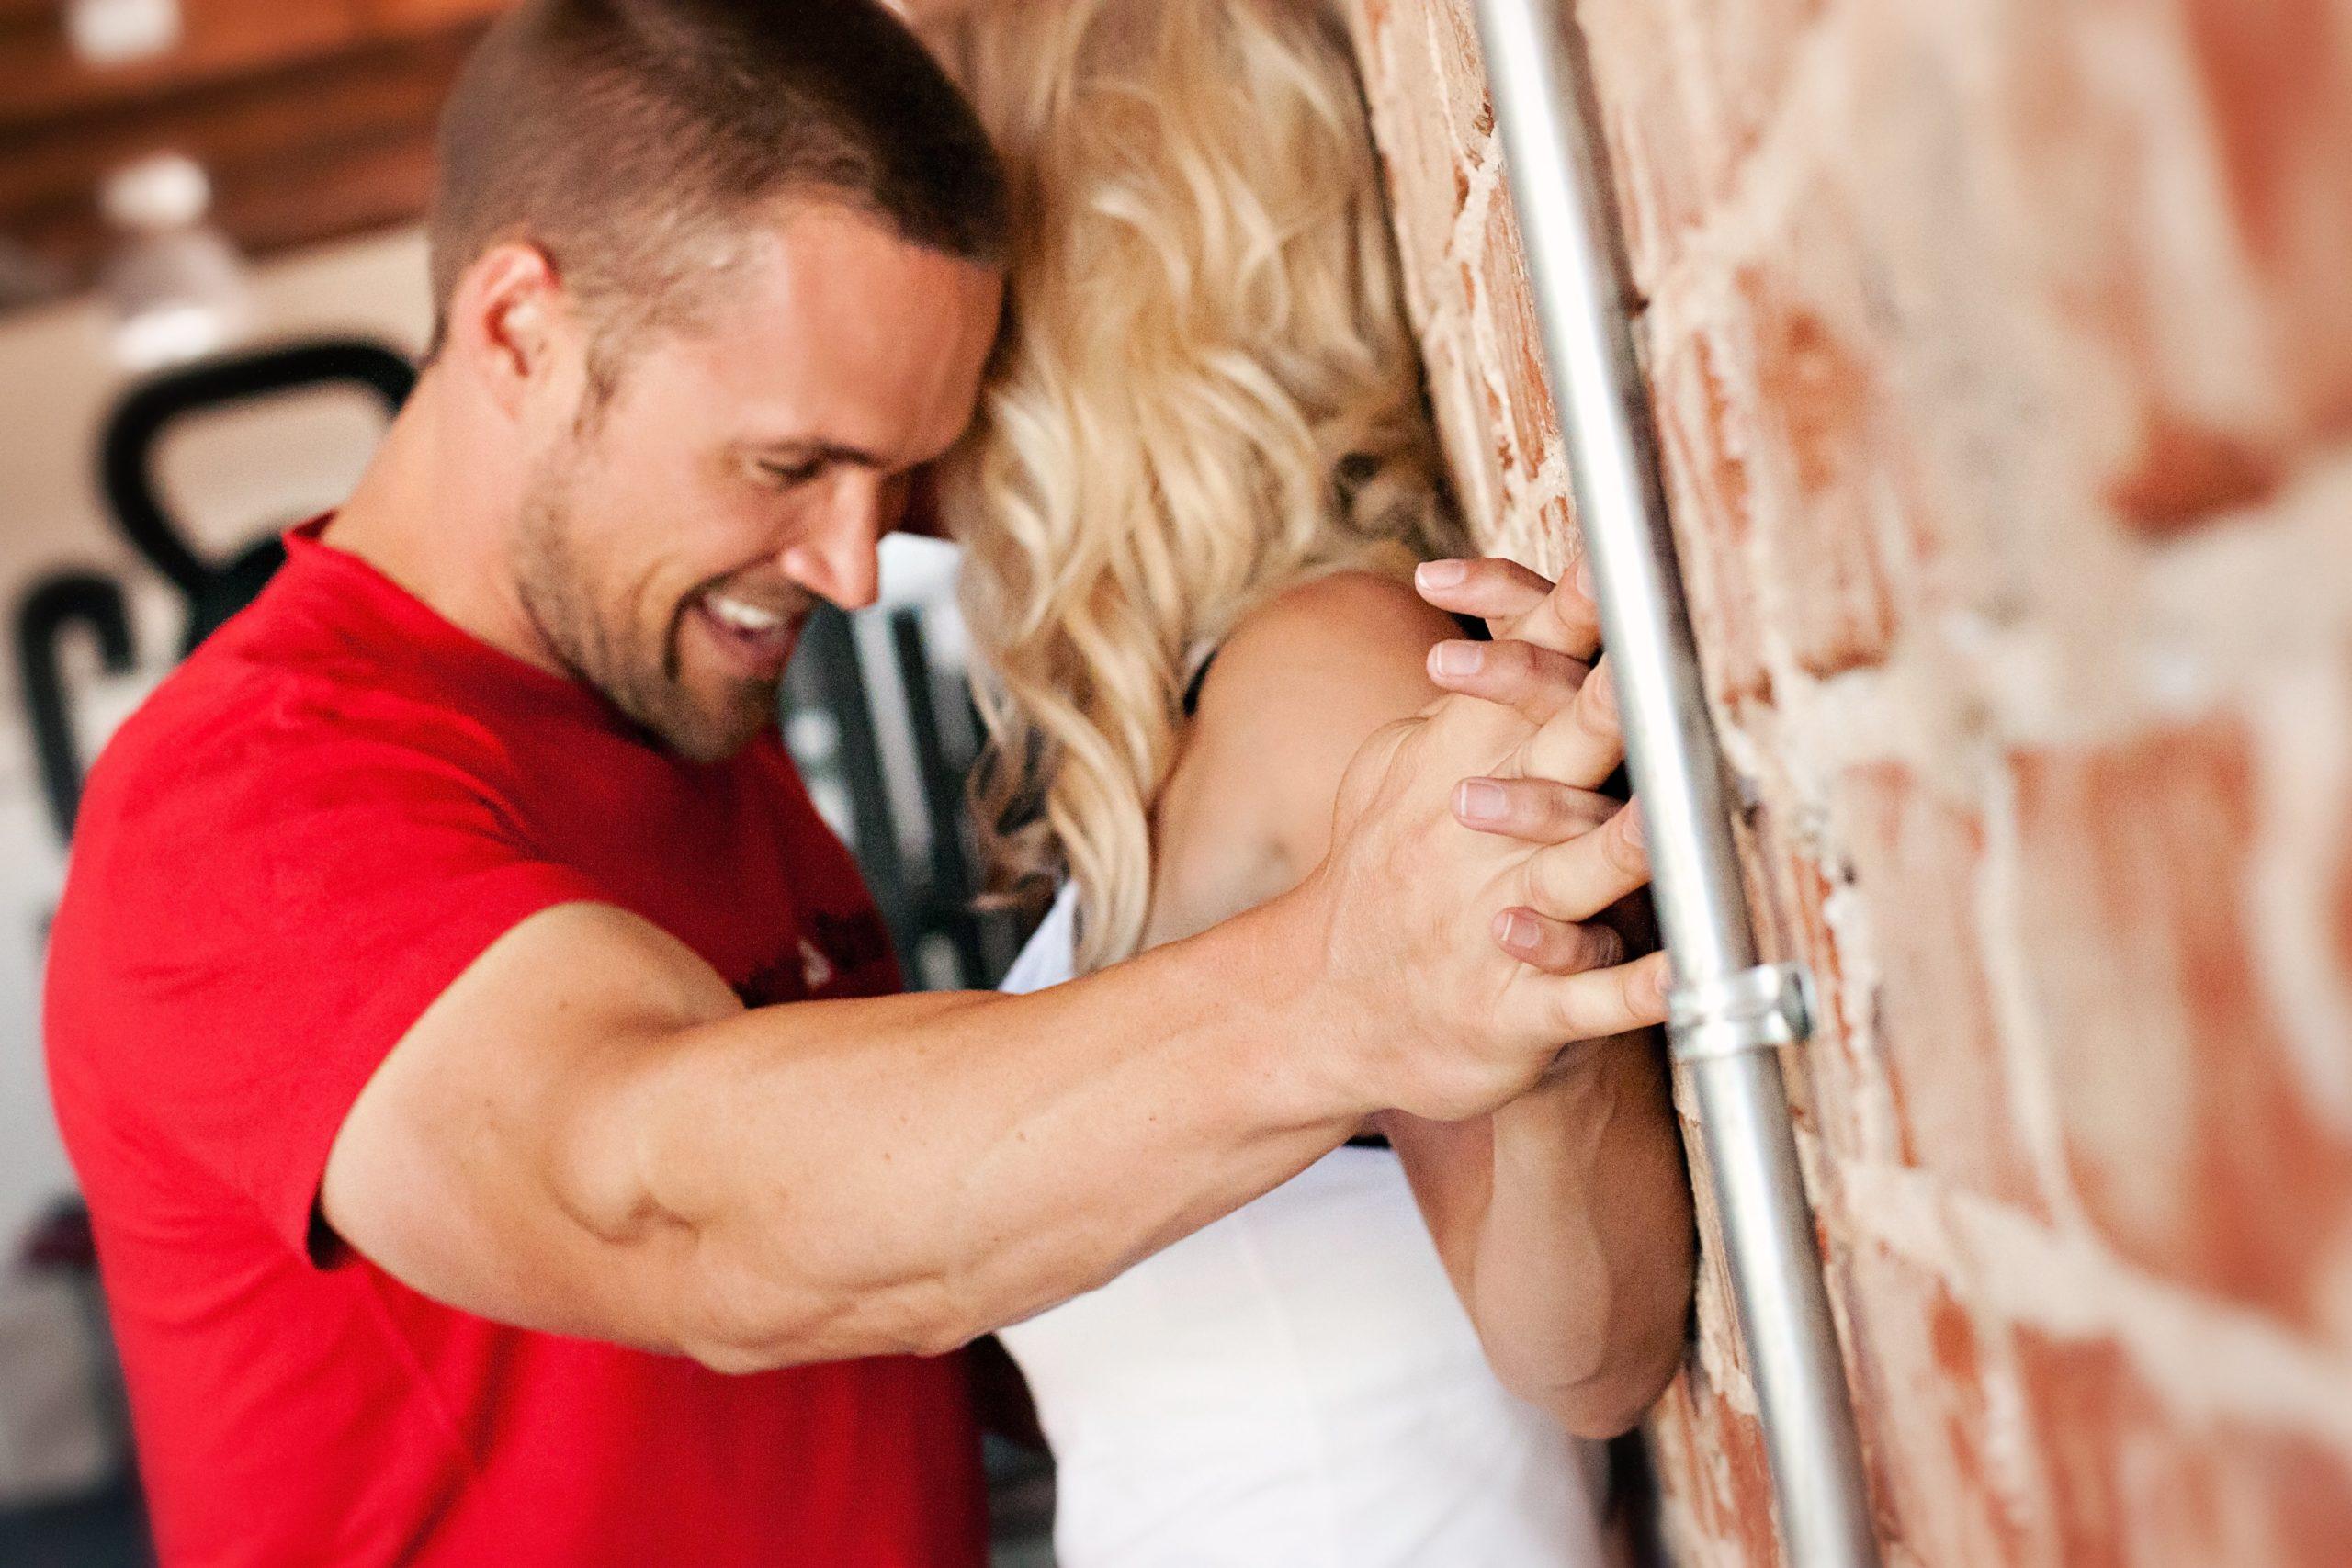 #HeidiPowell #Marriage #Romance #ChrisPowell